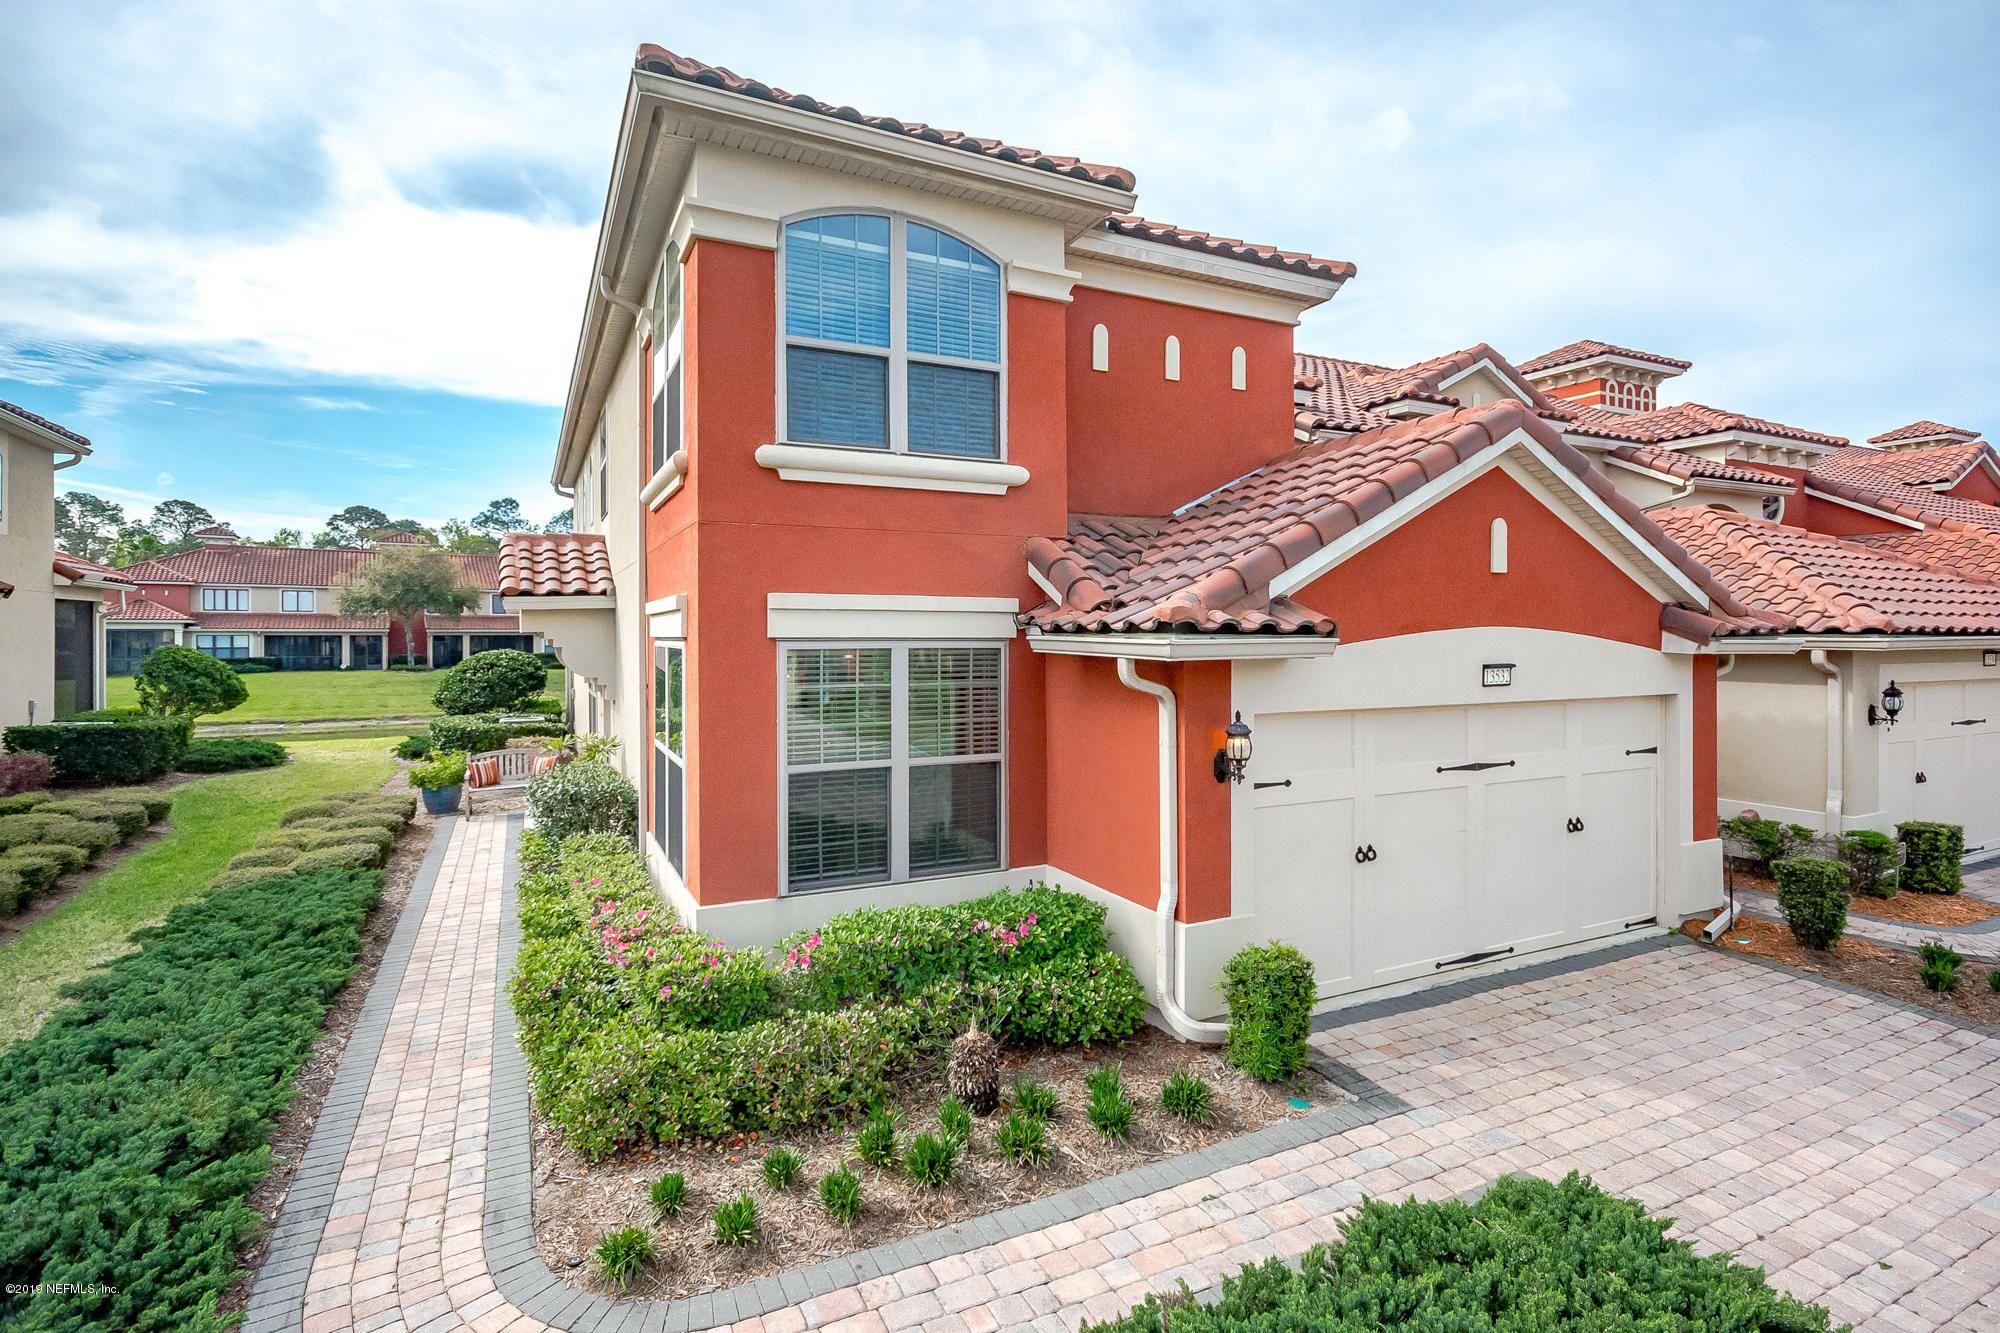 Admirable 13532 Montecito Pl Jacksonville Fl 32224 3 Bed 3 Bath Townhouse Mls 985709 37 Photos Trulia Interior Design Ideas Tzicisoteloinfo